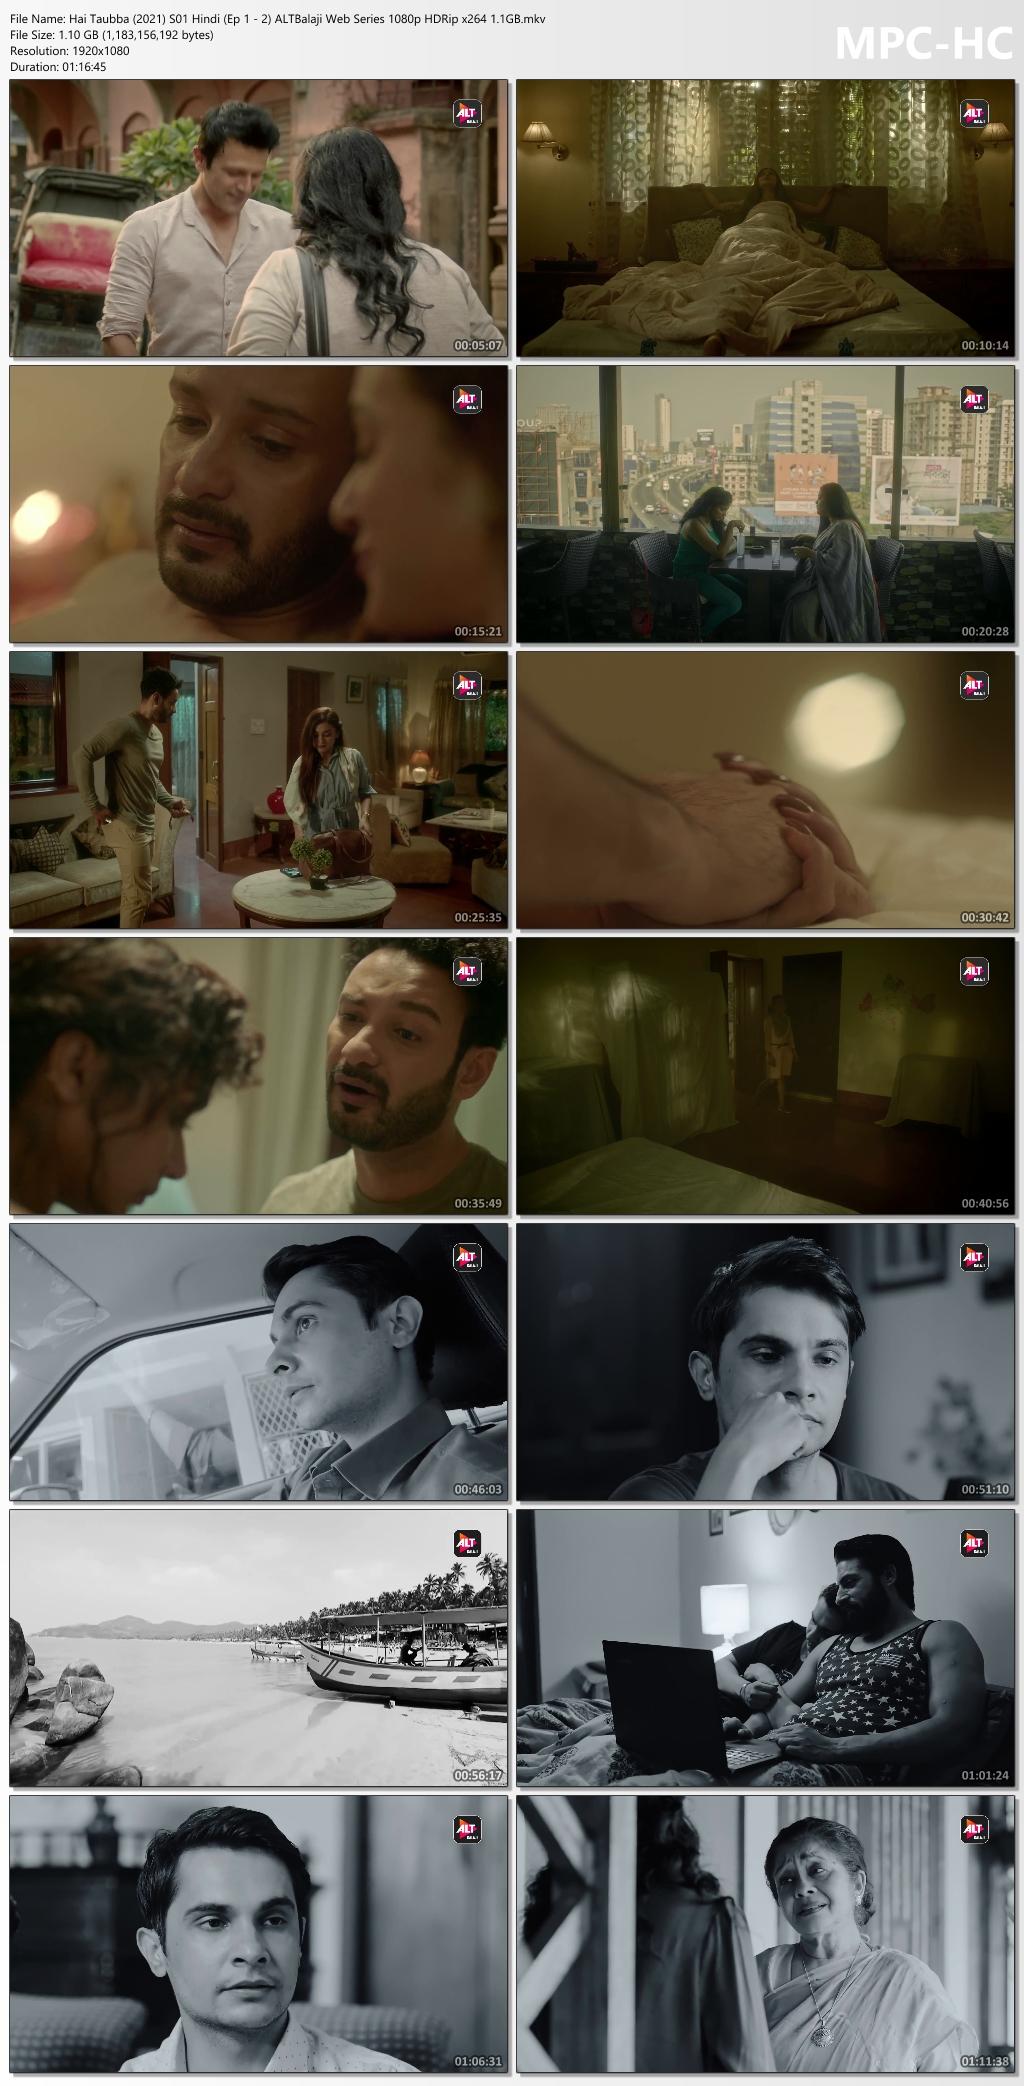 Hai-Taubba-2021-S01-Hindi-Ep-1-2-ALTBalaji-Web-Series-1080p-HDRip-x264-1-1-GB-mkv-thumbs